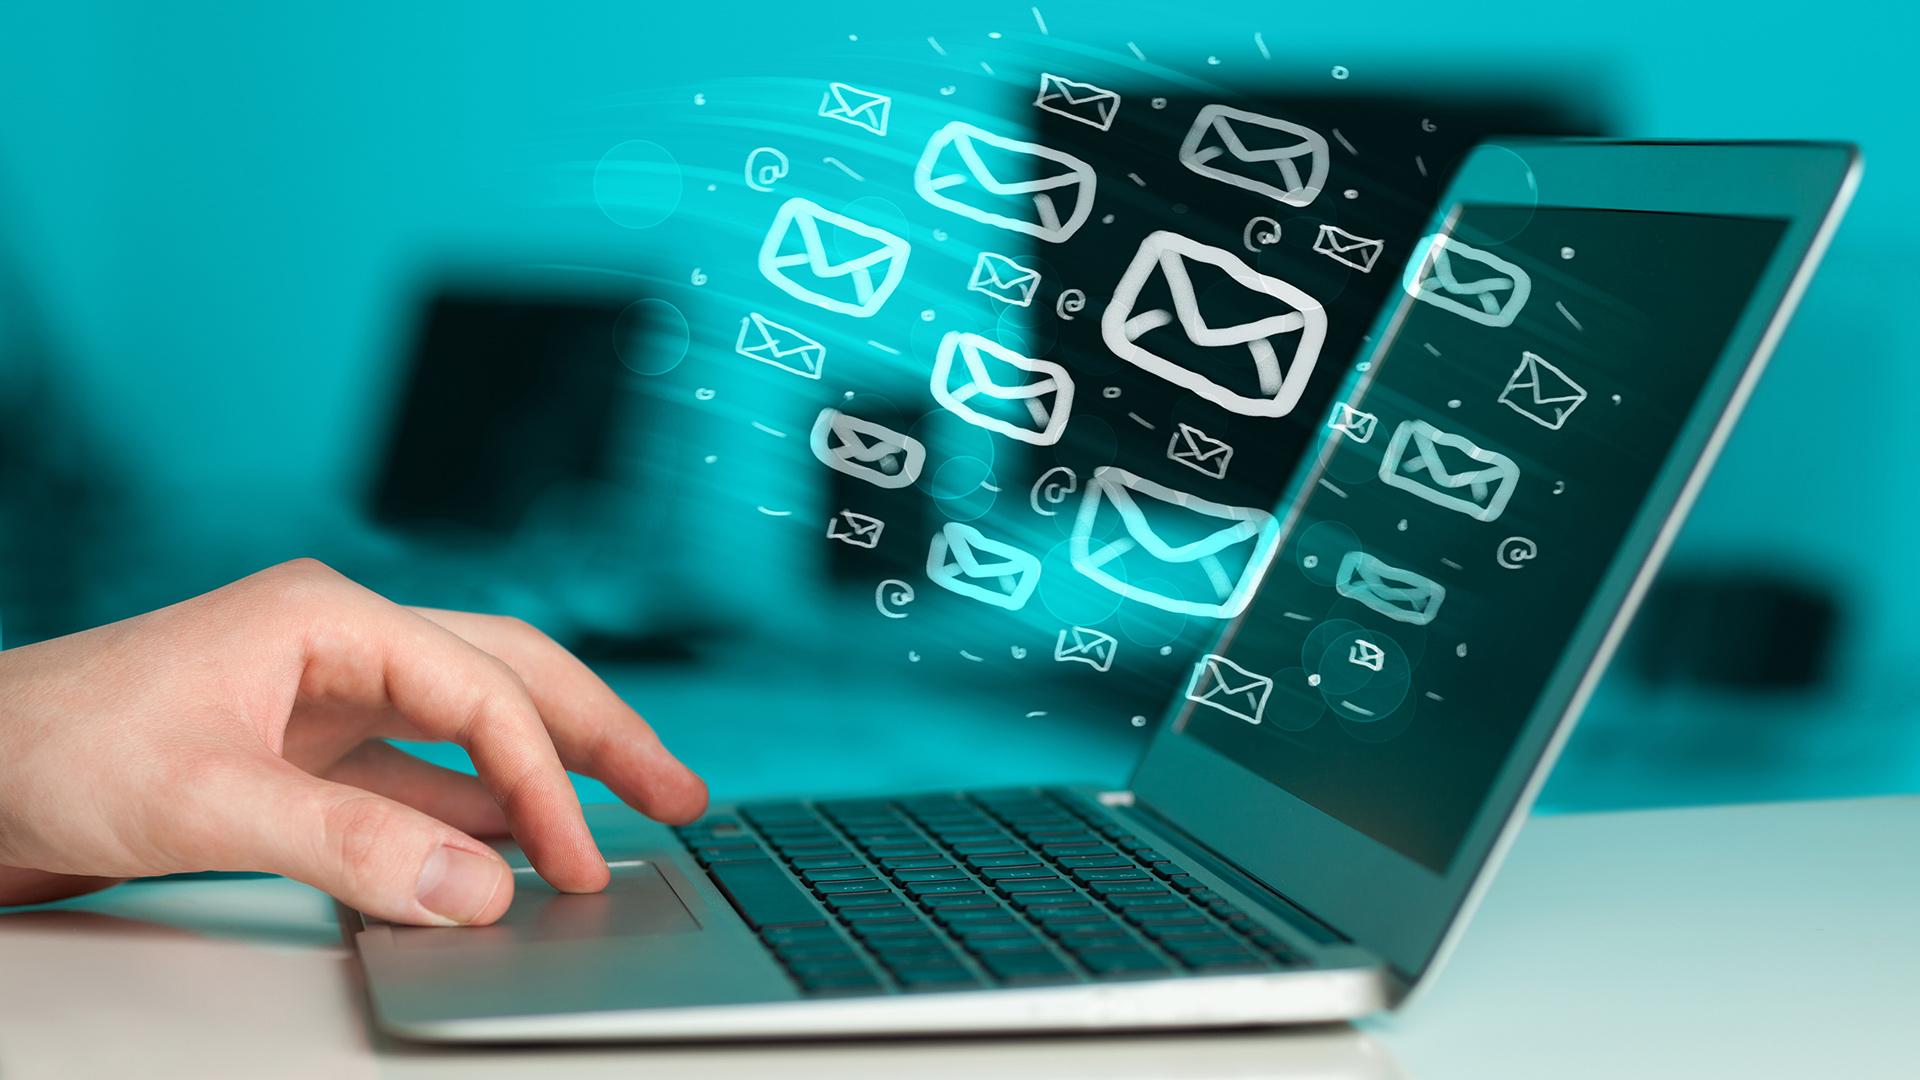 E-mail on a laptop